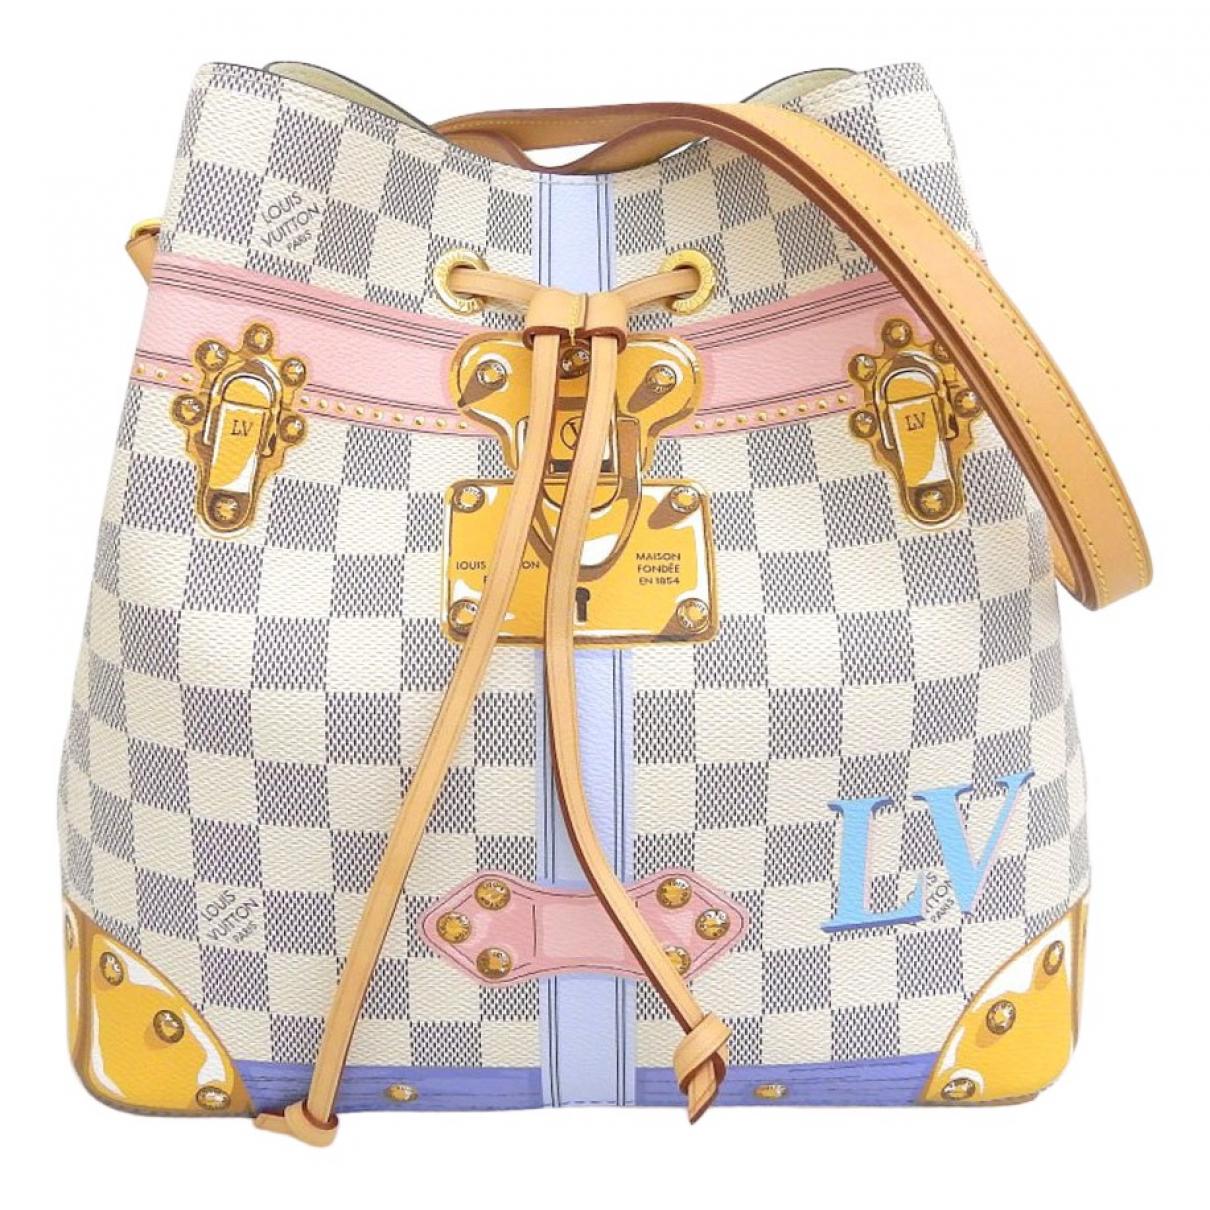 Louis Vuitton NeoNoe Handtasche in  Weiss Leinen